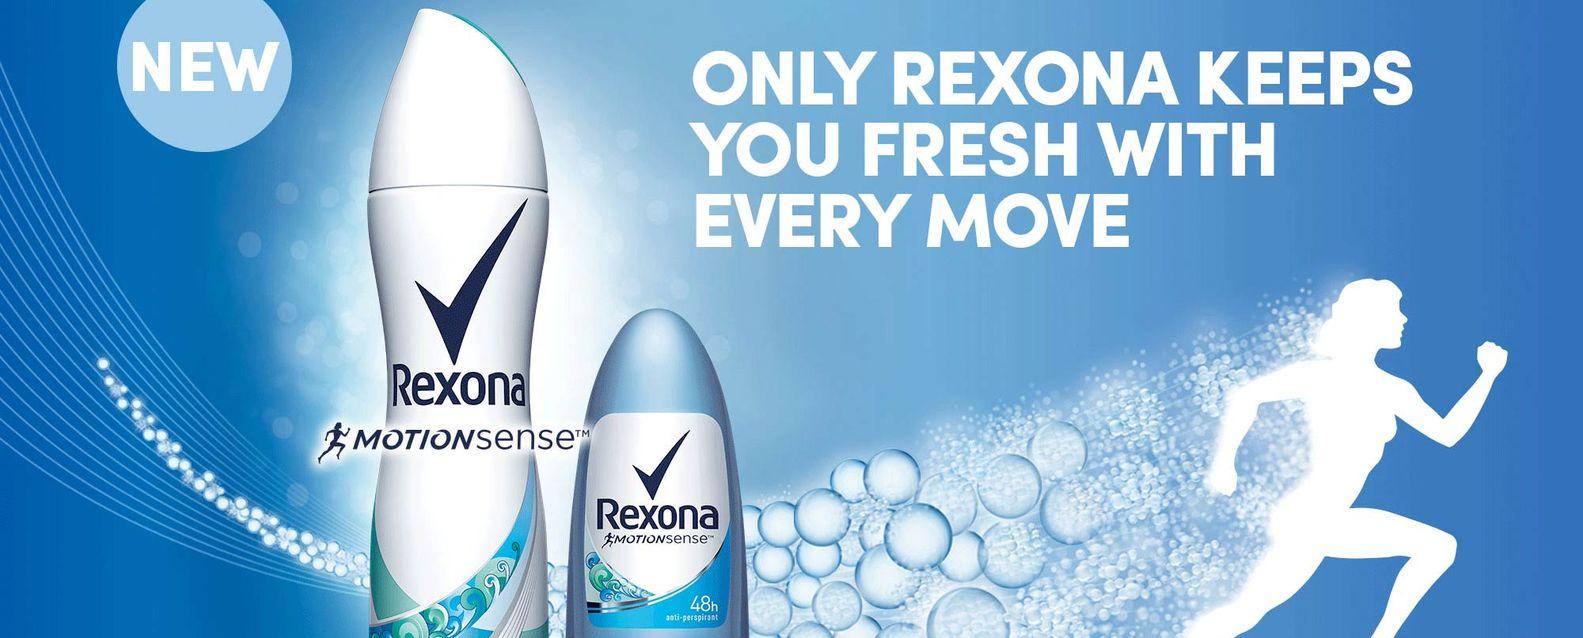 Rexona advertising banner